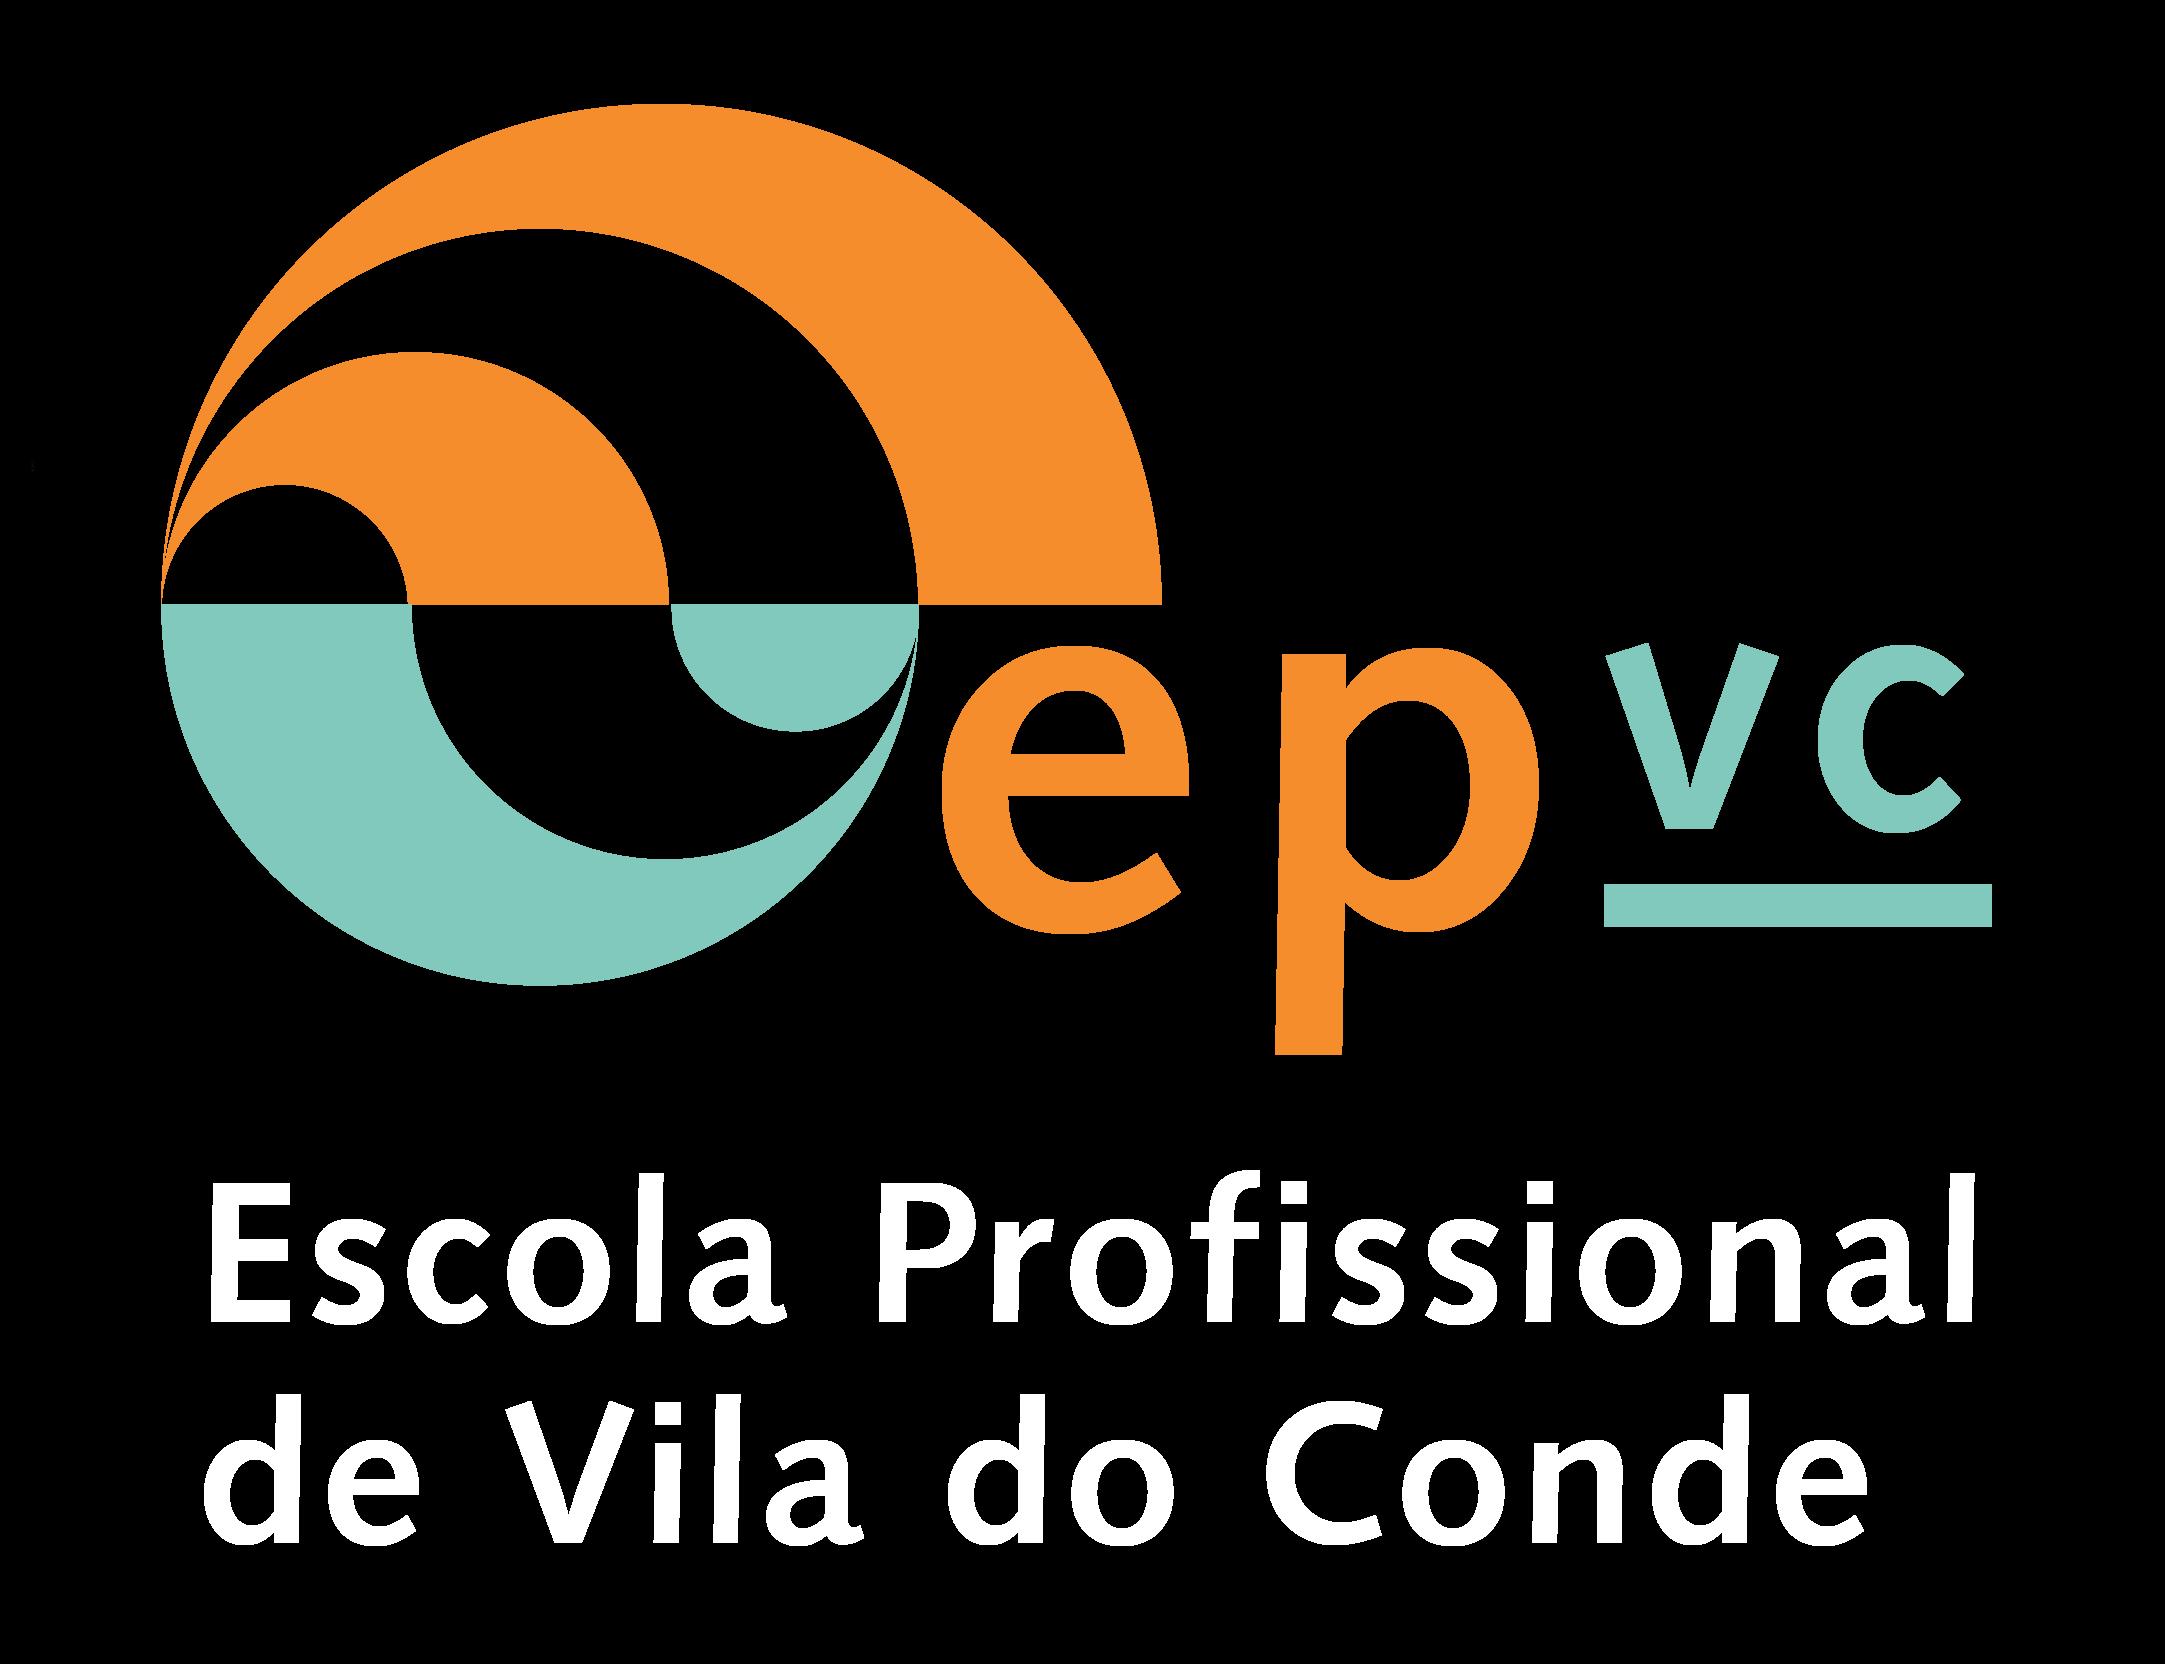 Escola Profissional de Vila do Conde – EPVC